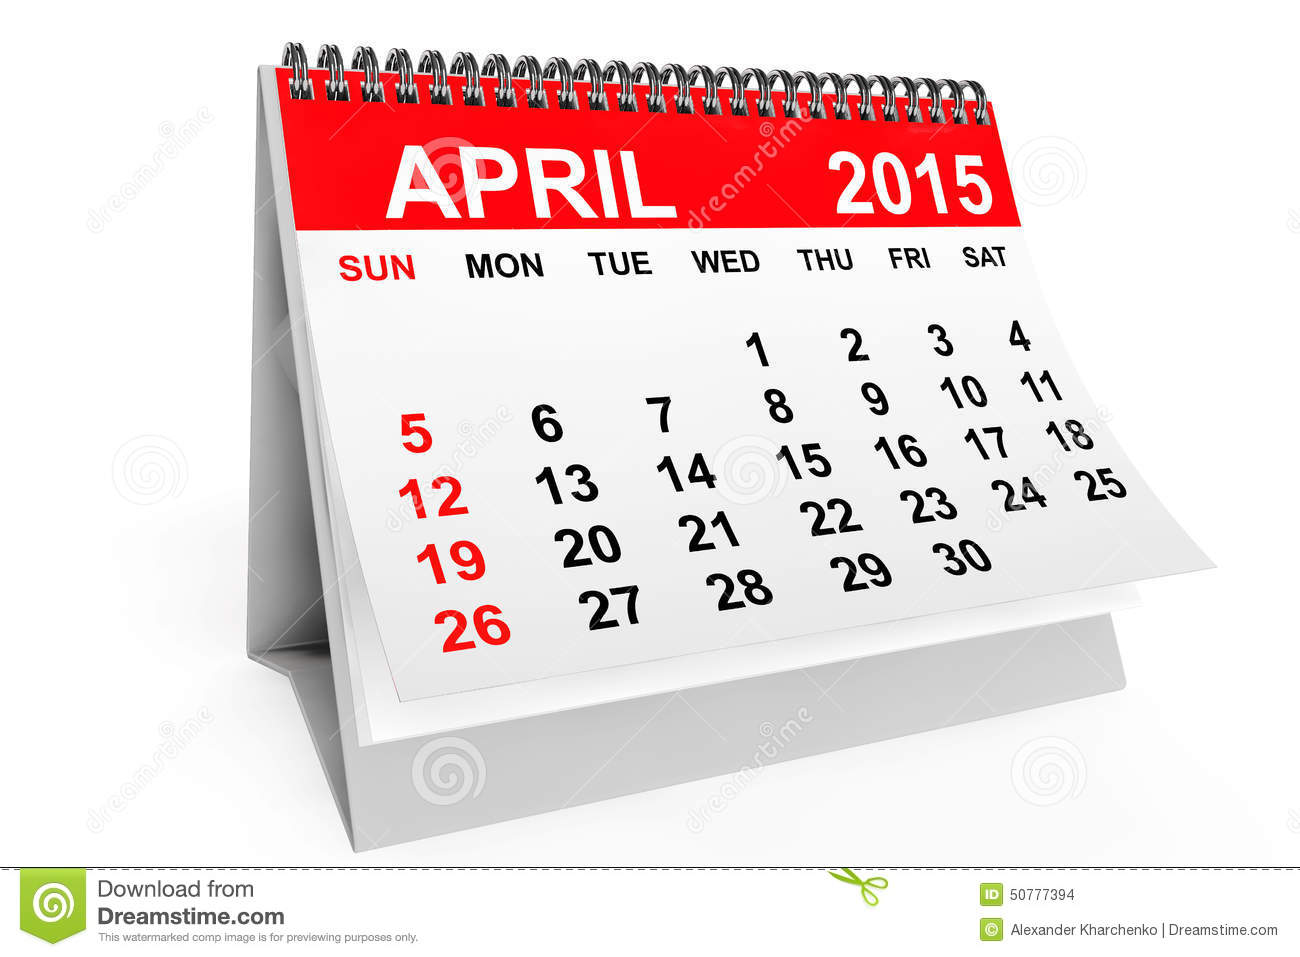 April 28th calendar clipart freeuse stock April 2015 calendar clipart - ClipartFest freeuse stock